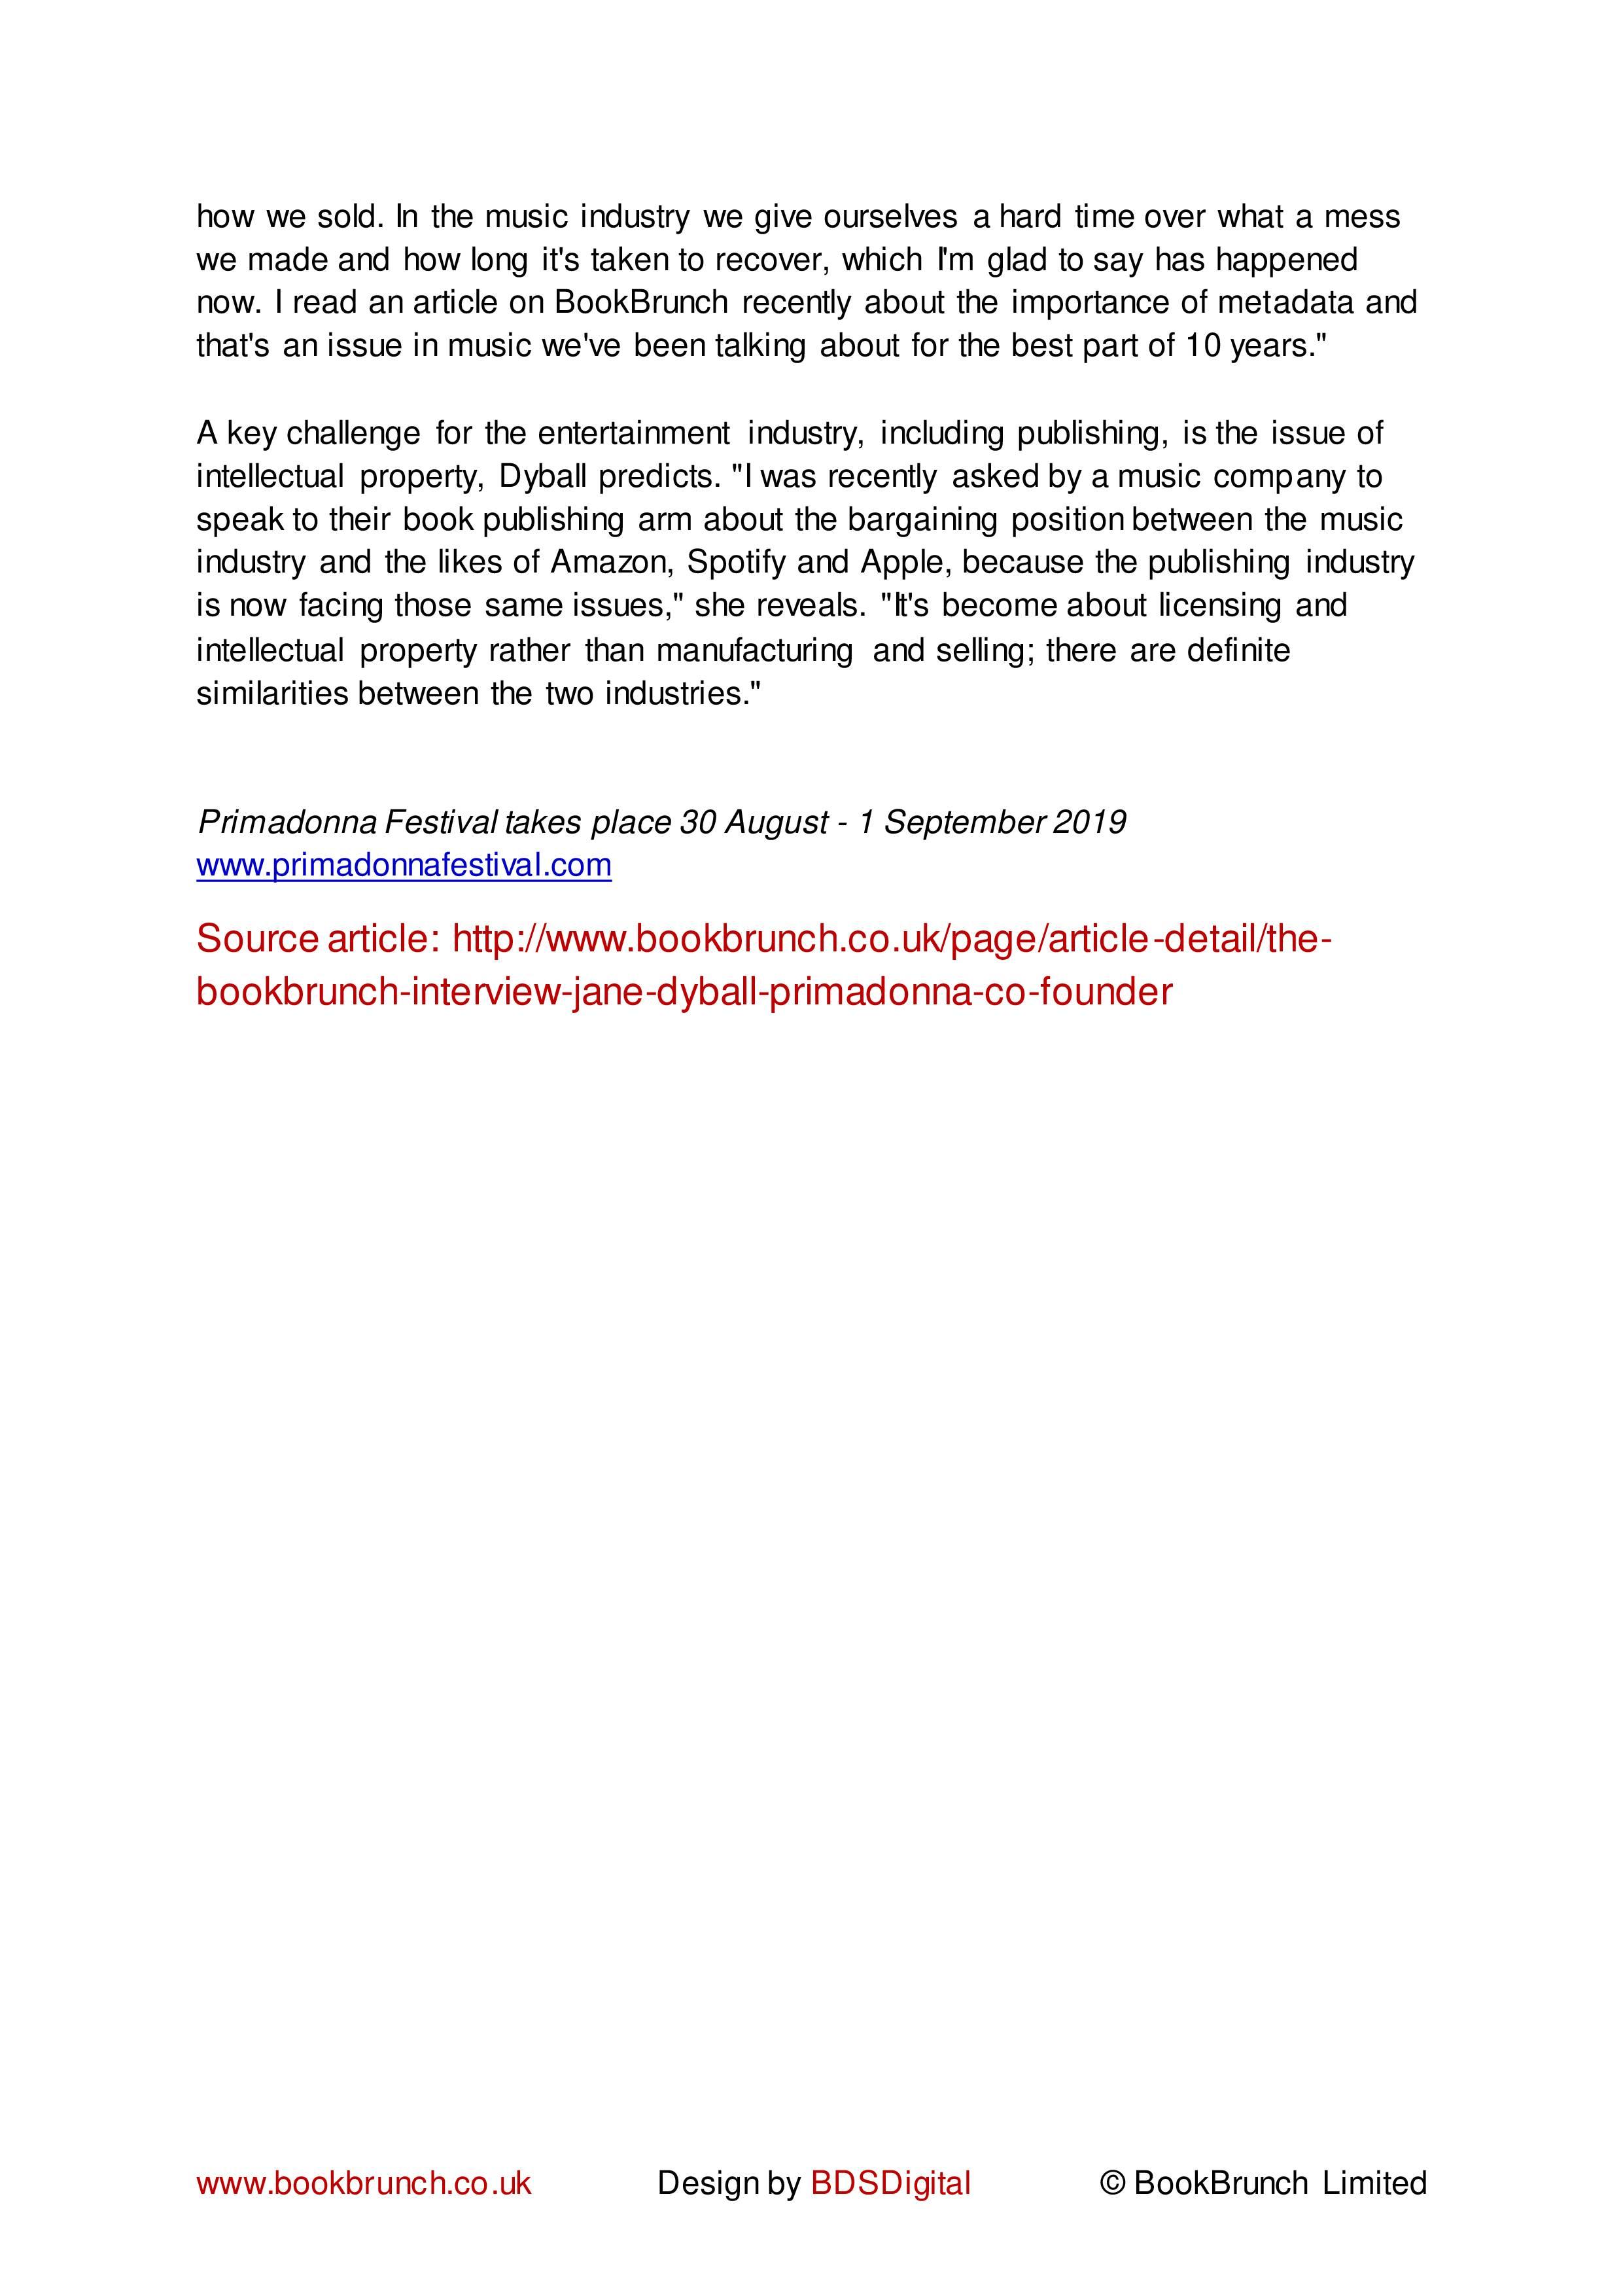 BookBrunch PDF Export - The BookBrunch Interview_ Jane Dyball, Primadonna co-founder (1)-3.jpg